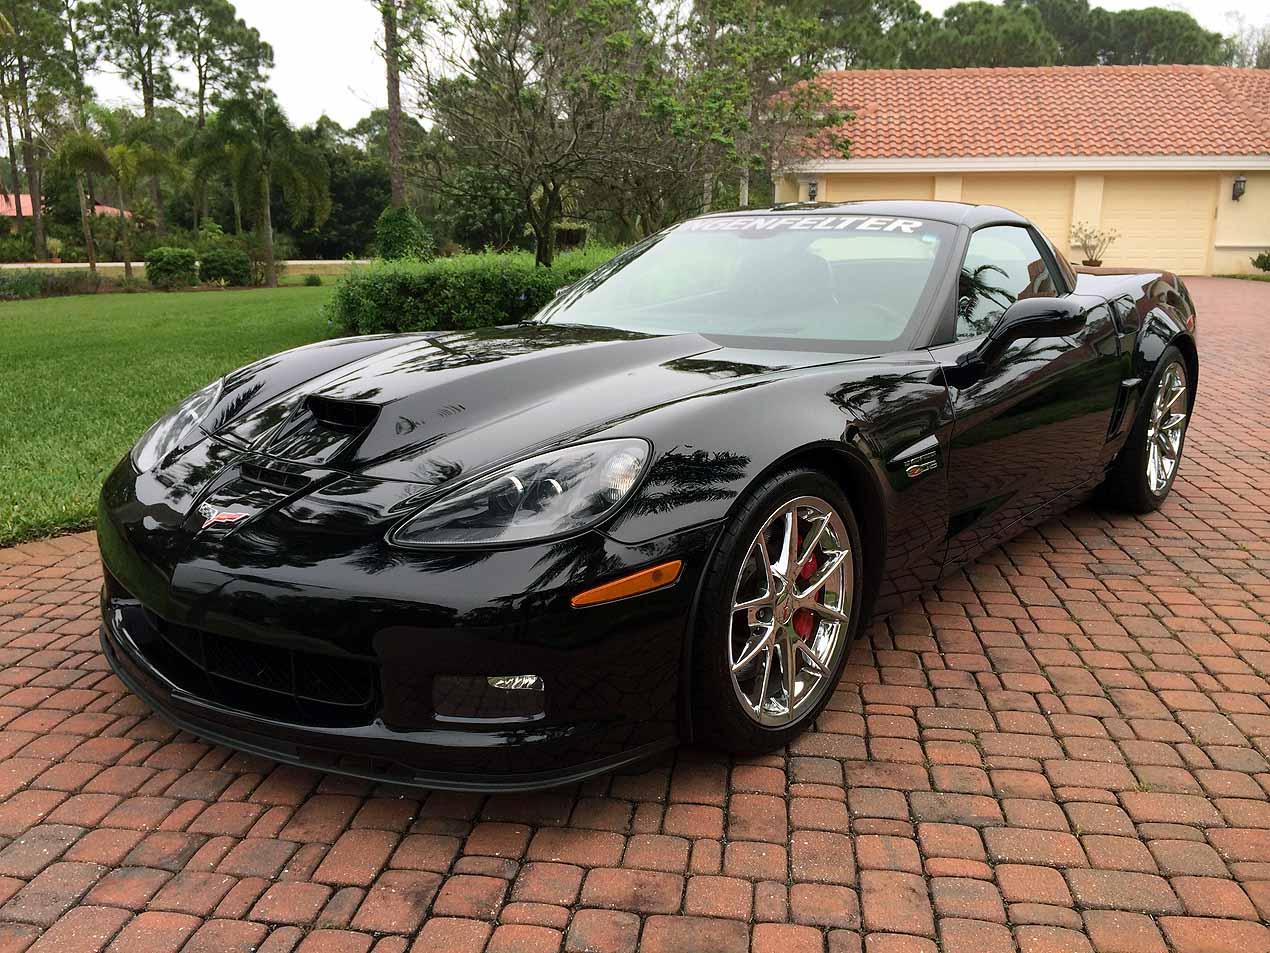 we buy sell used cars naples fl mercedes bmw used car dealer auto haus florida. Black Bedroom Furniture Sets. Home Design Ideas